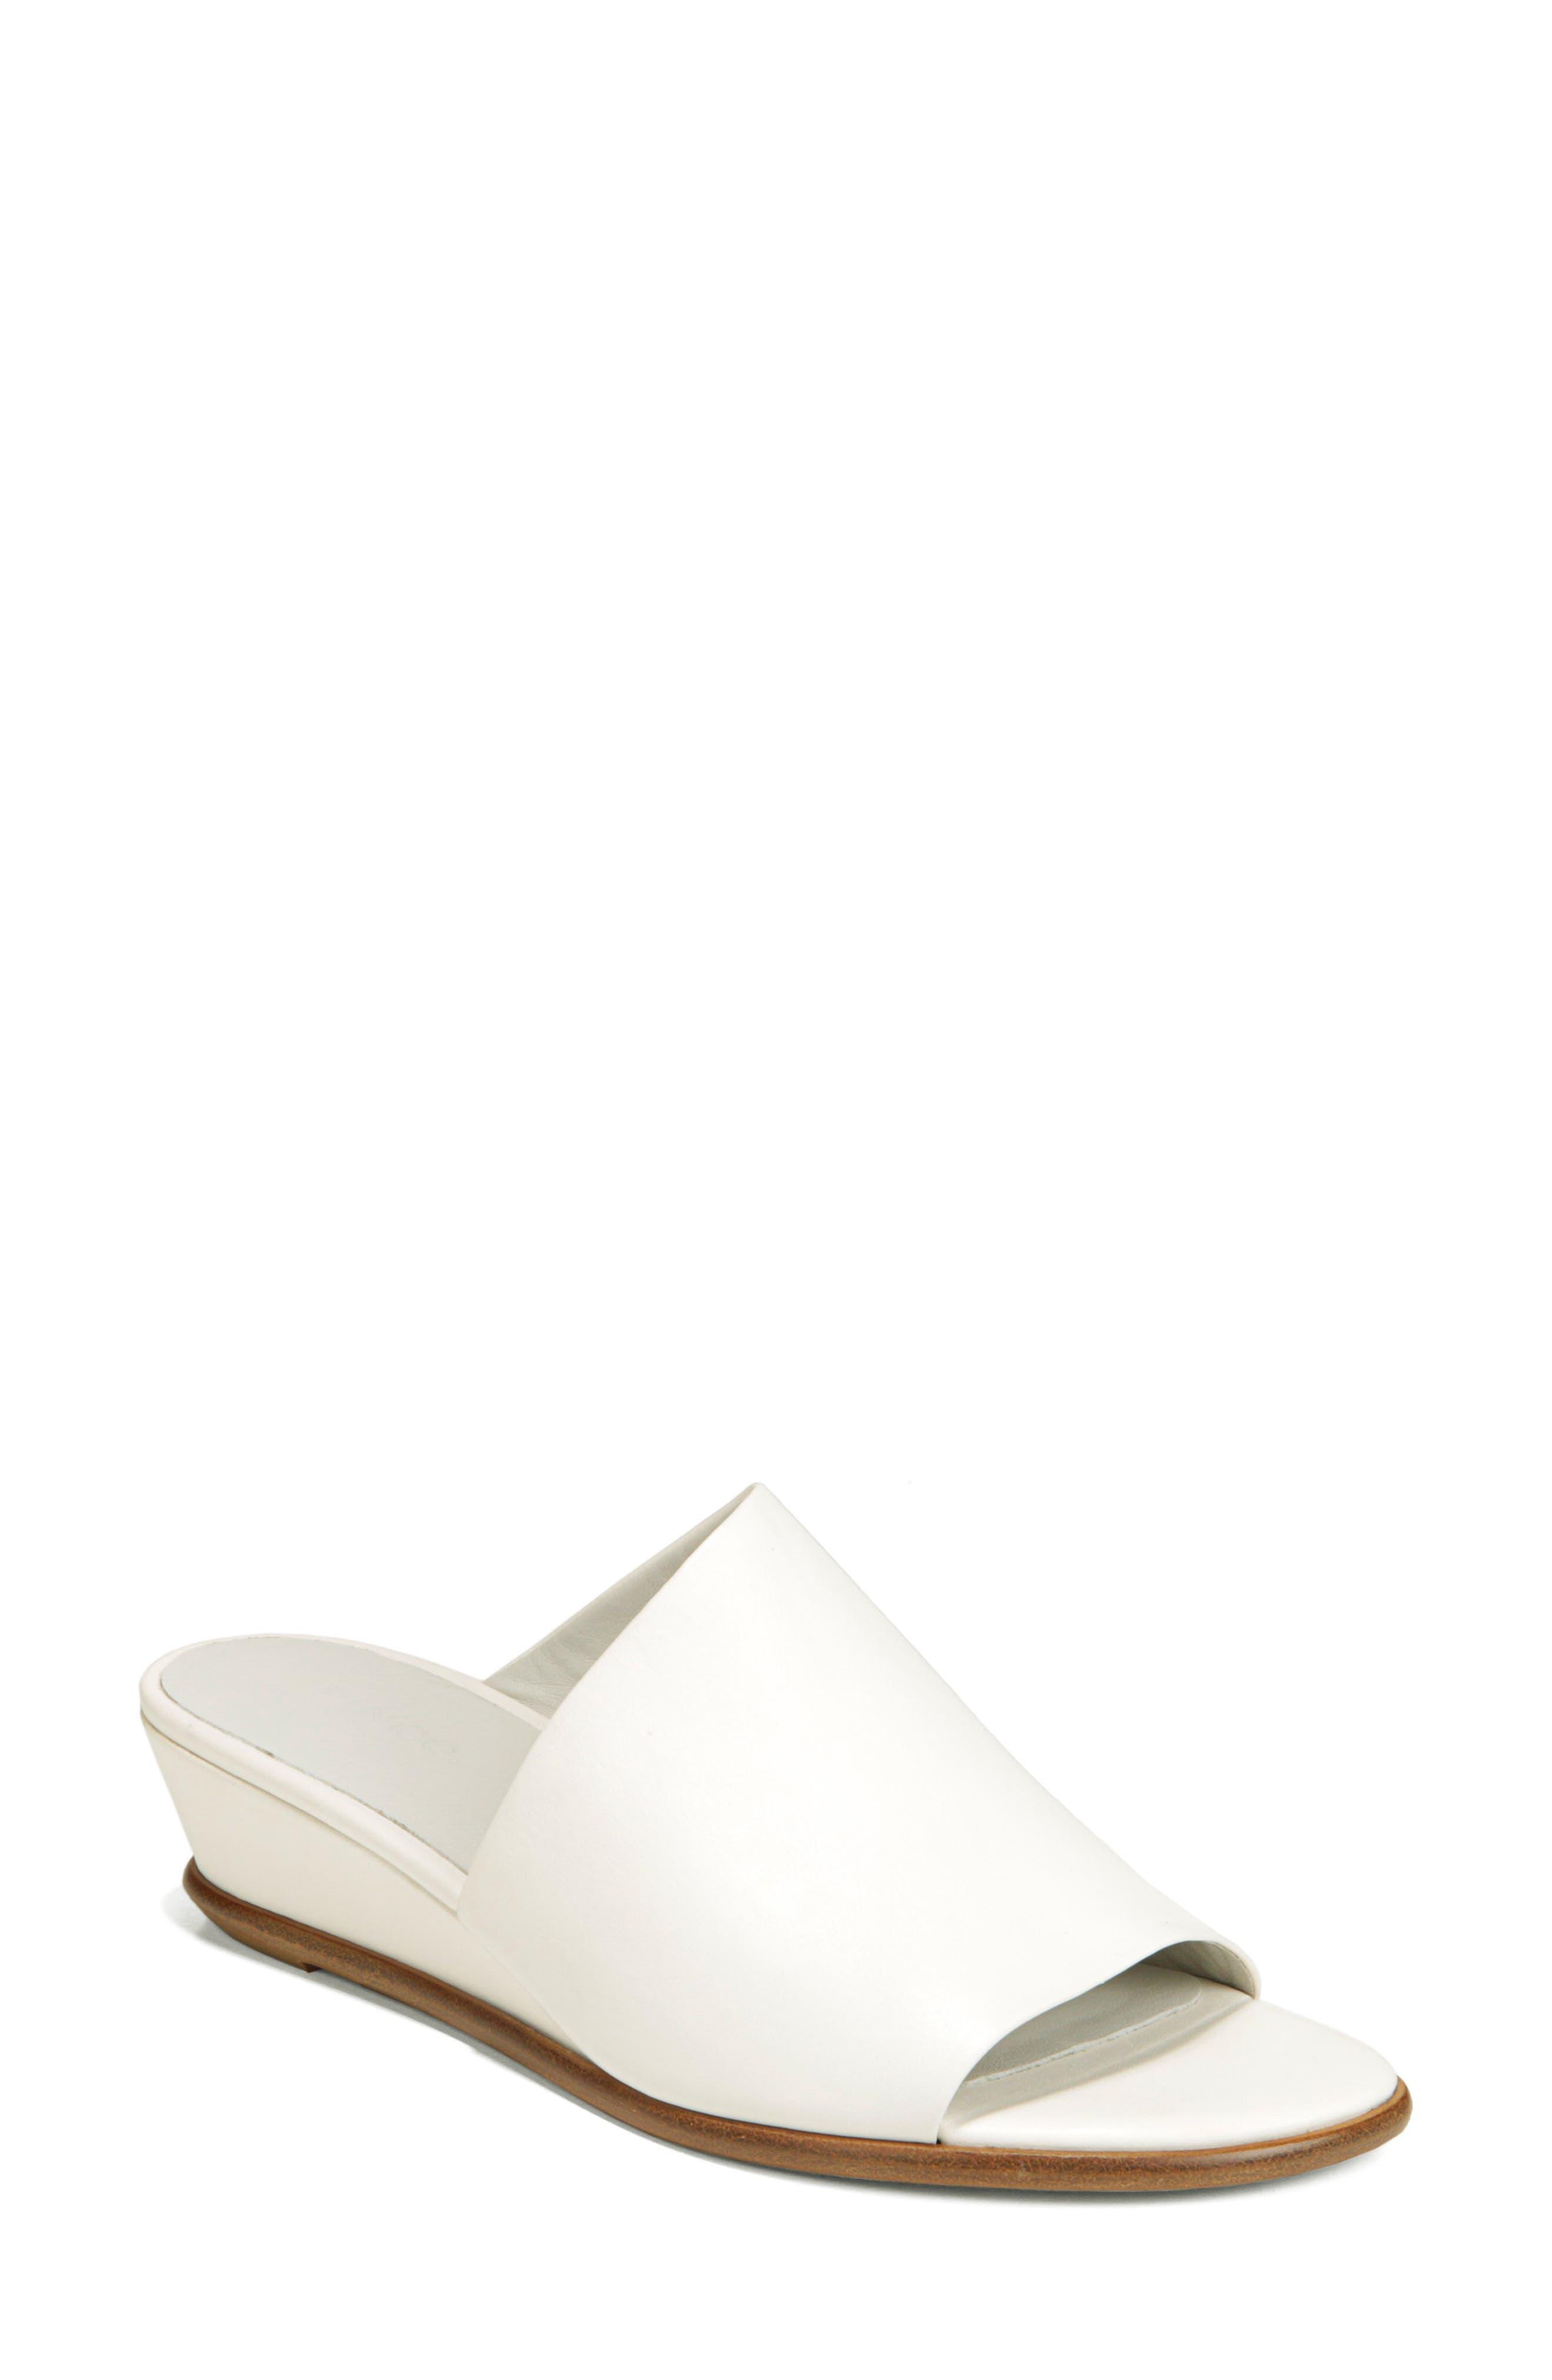 VINCE Duvall Asymmetrical Wedge Sandal, Main, color, OFF WHITE